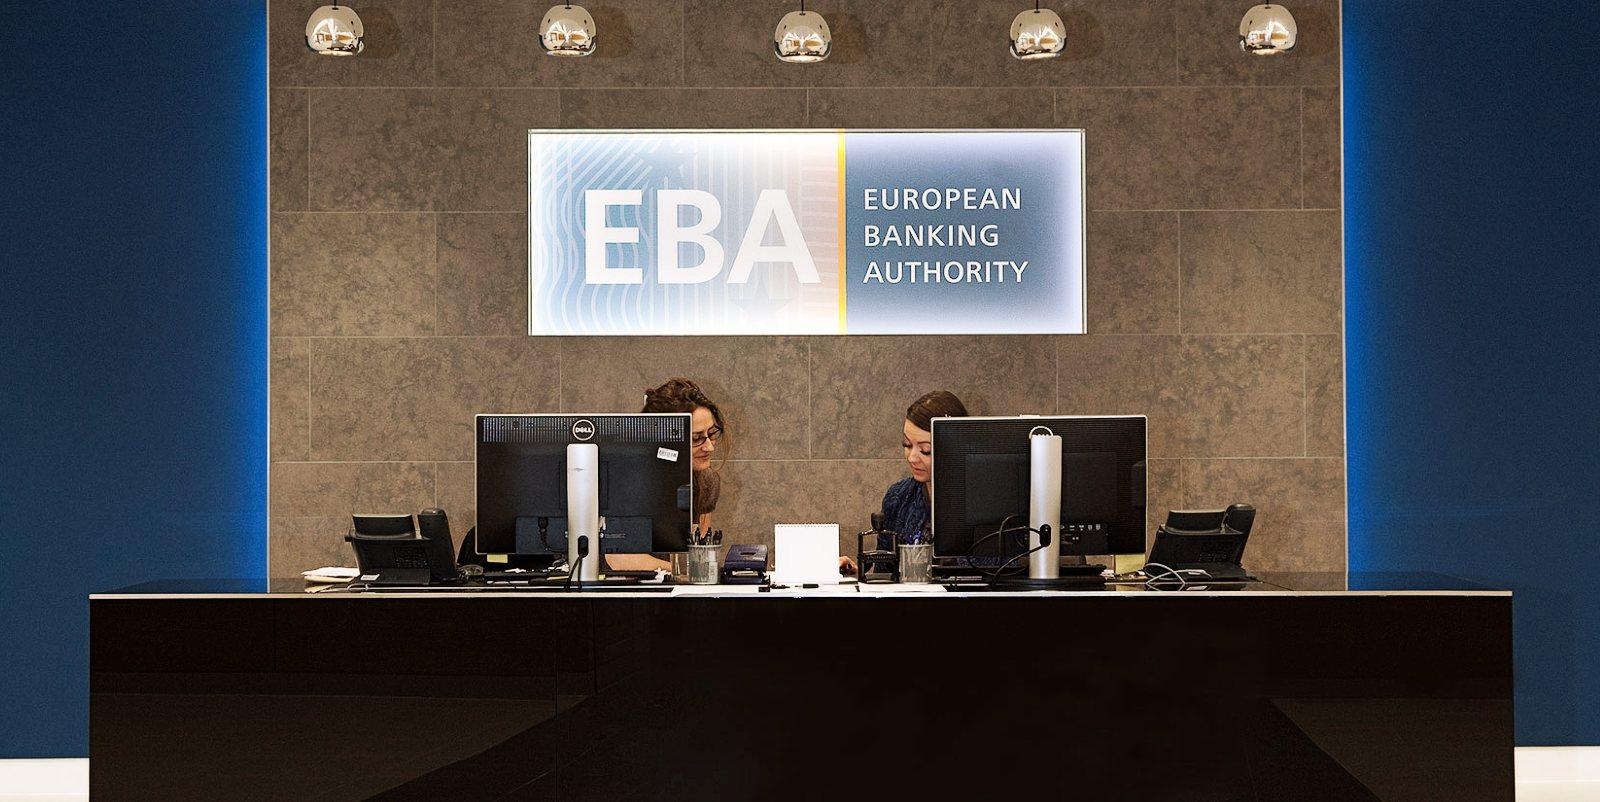 European Banking Authority discloses Exchange server hack